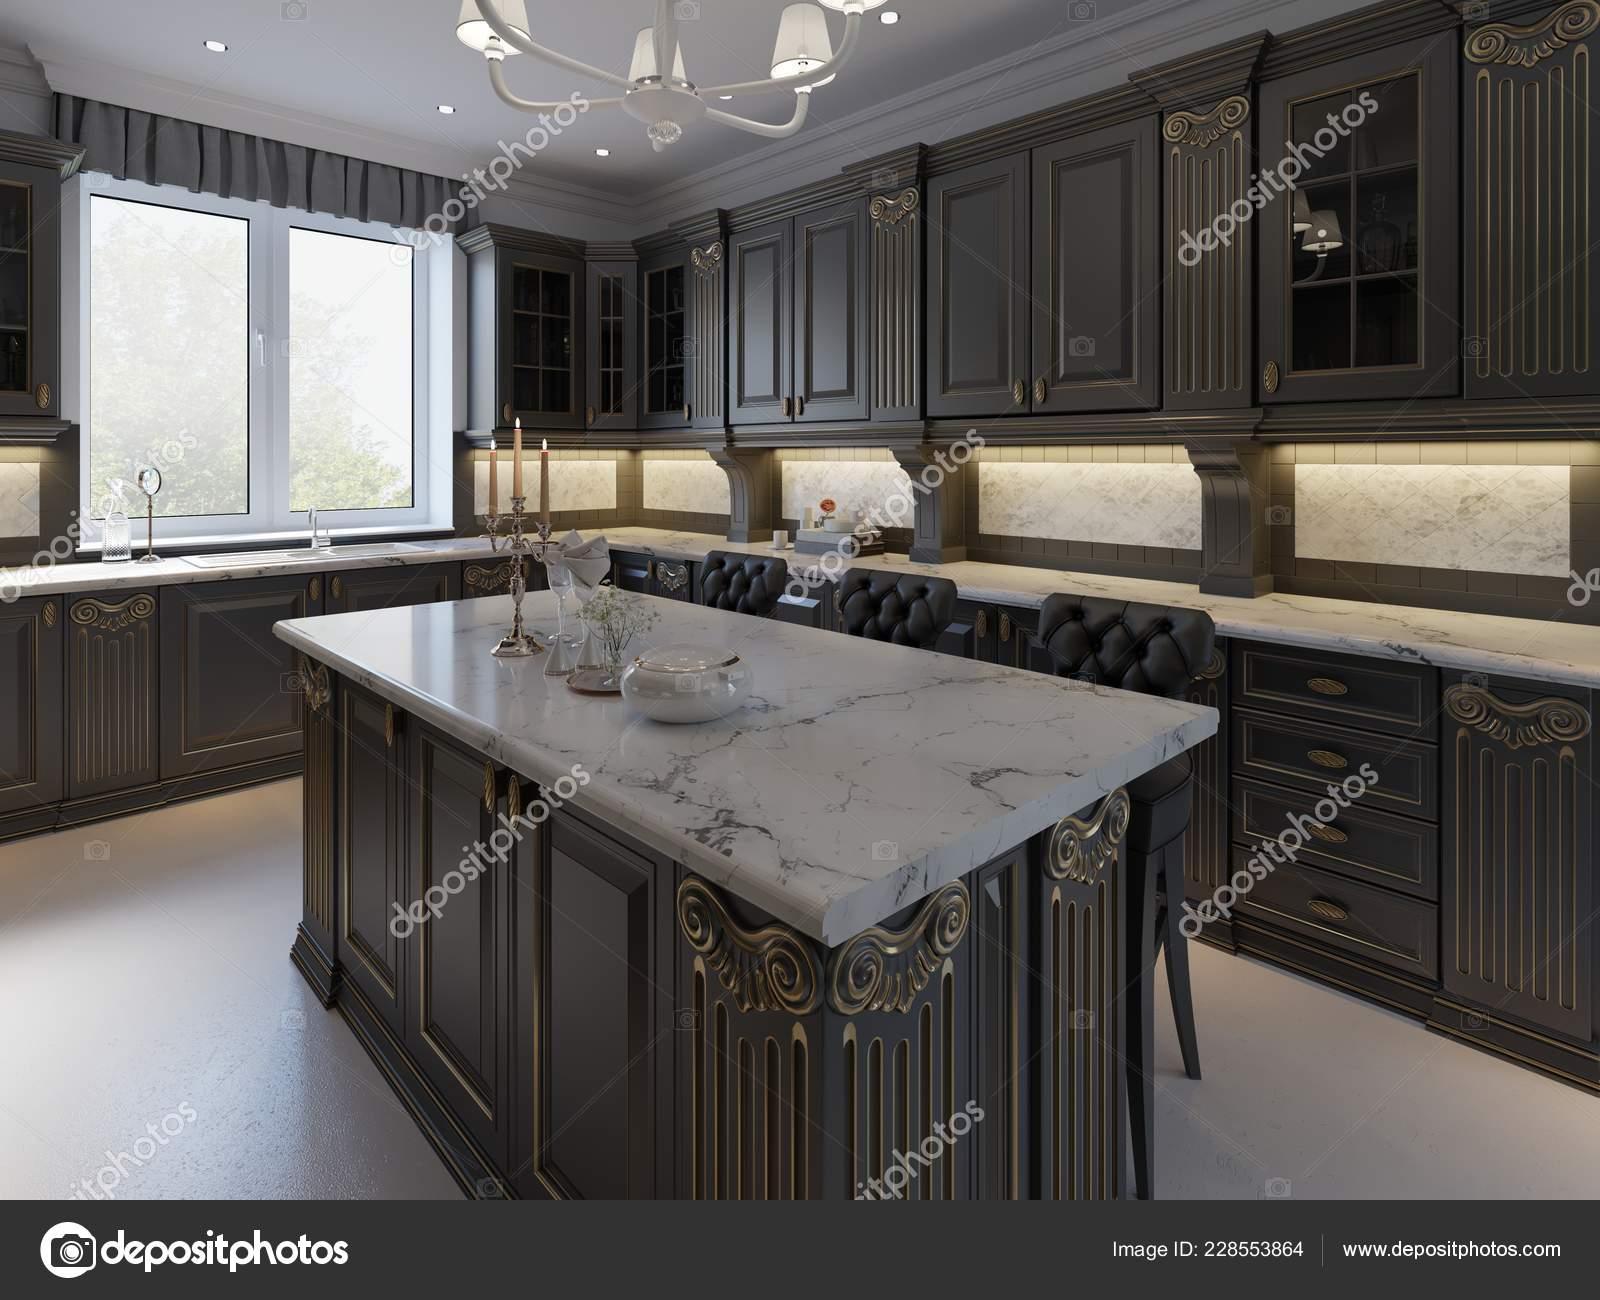 Black Bar Stools Kitchen Island Bright Living Room Rendering Stock Photo C Kuprin33 228553864